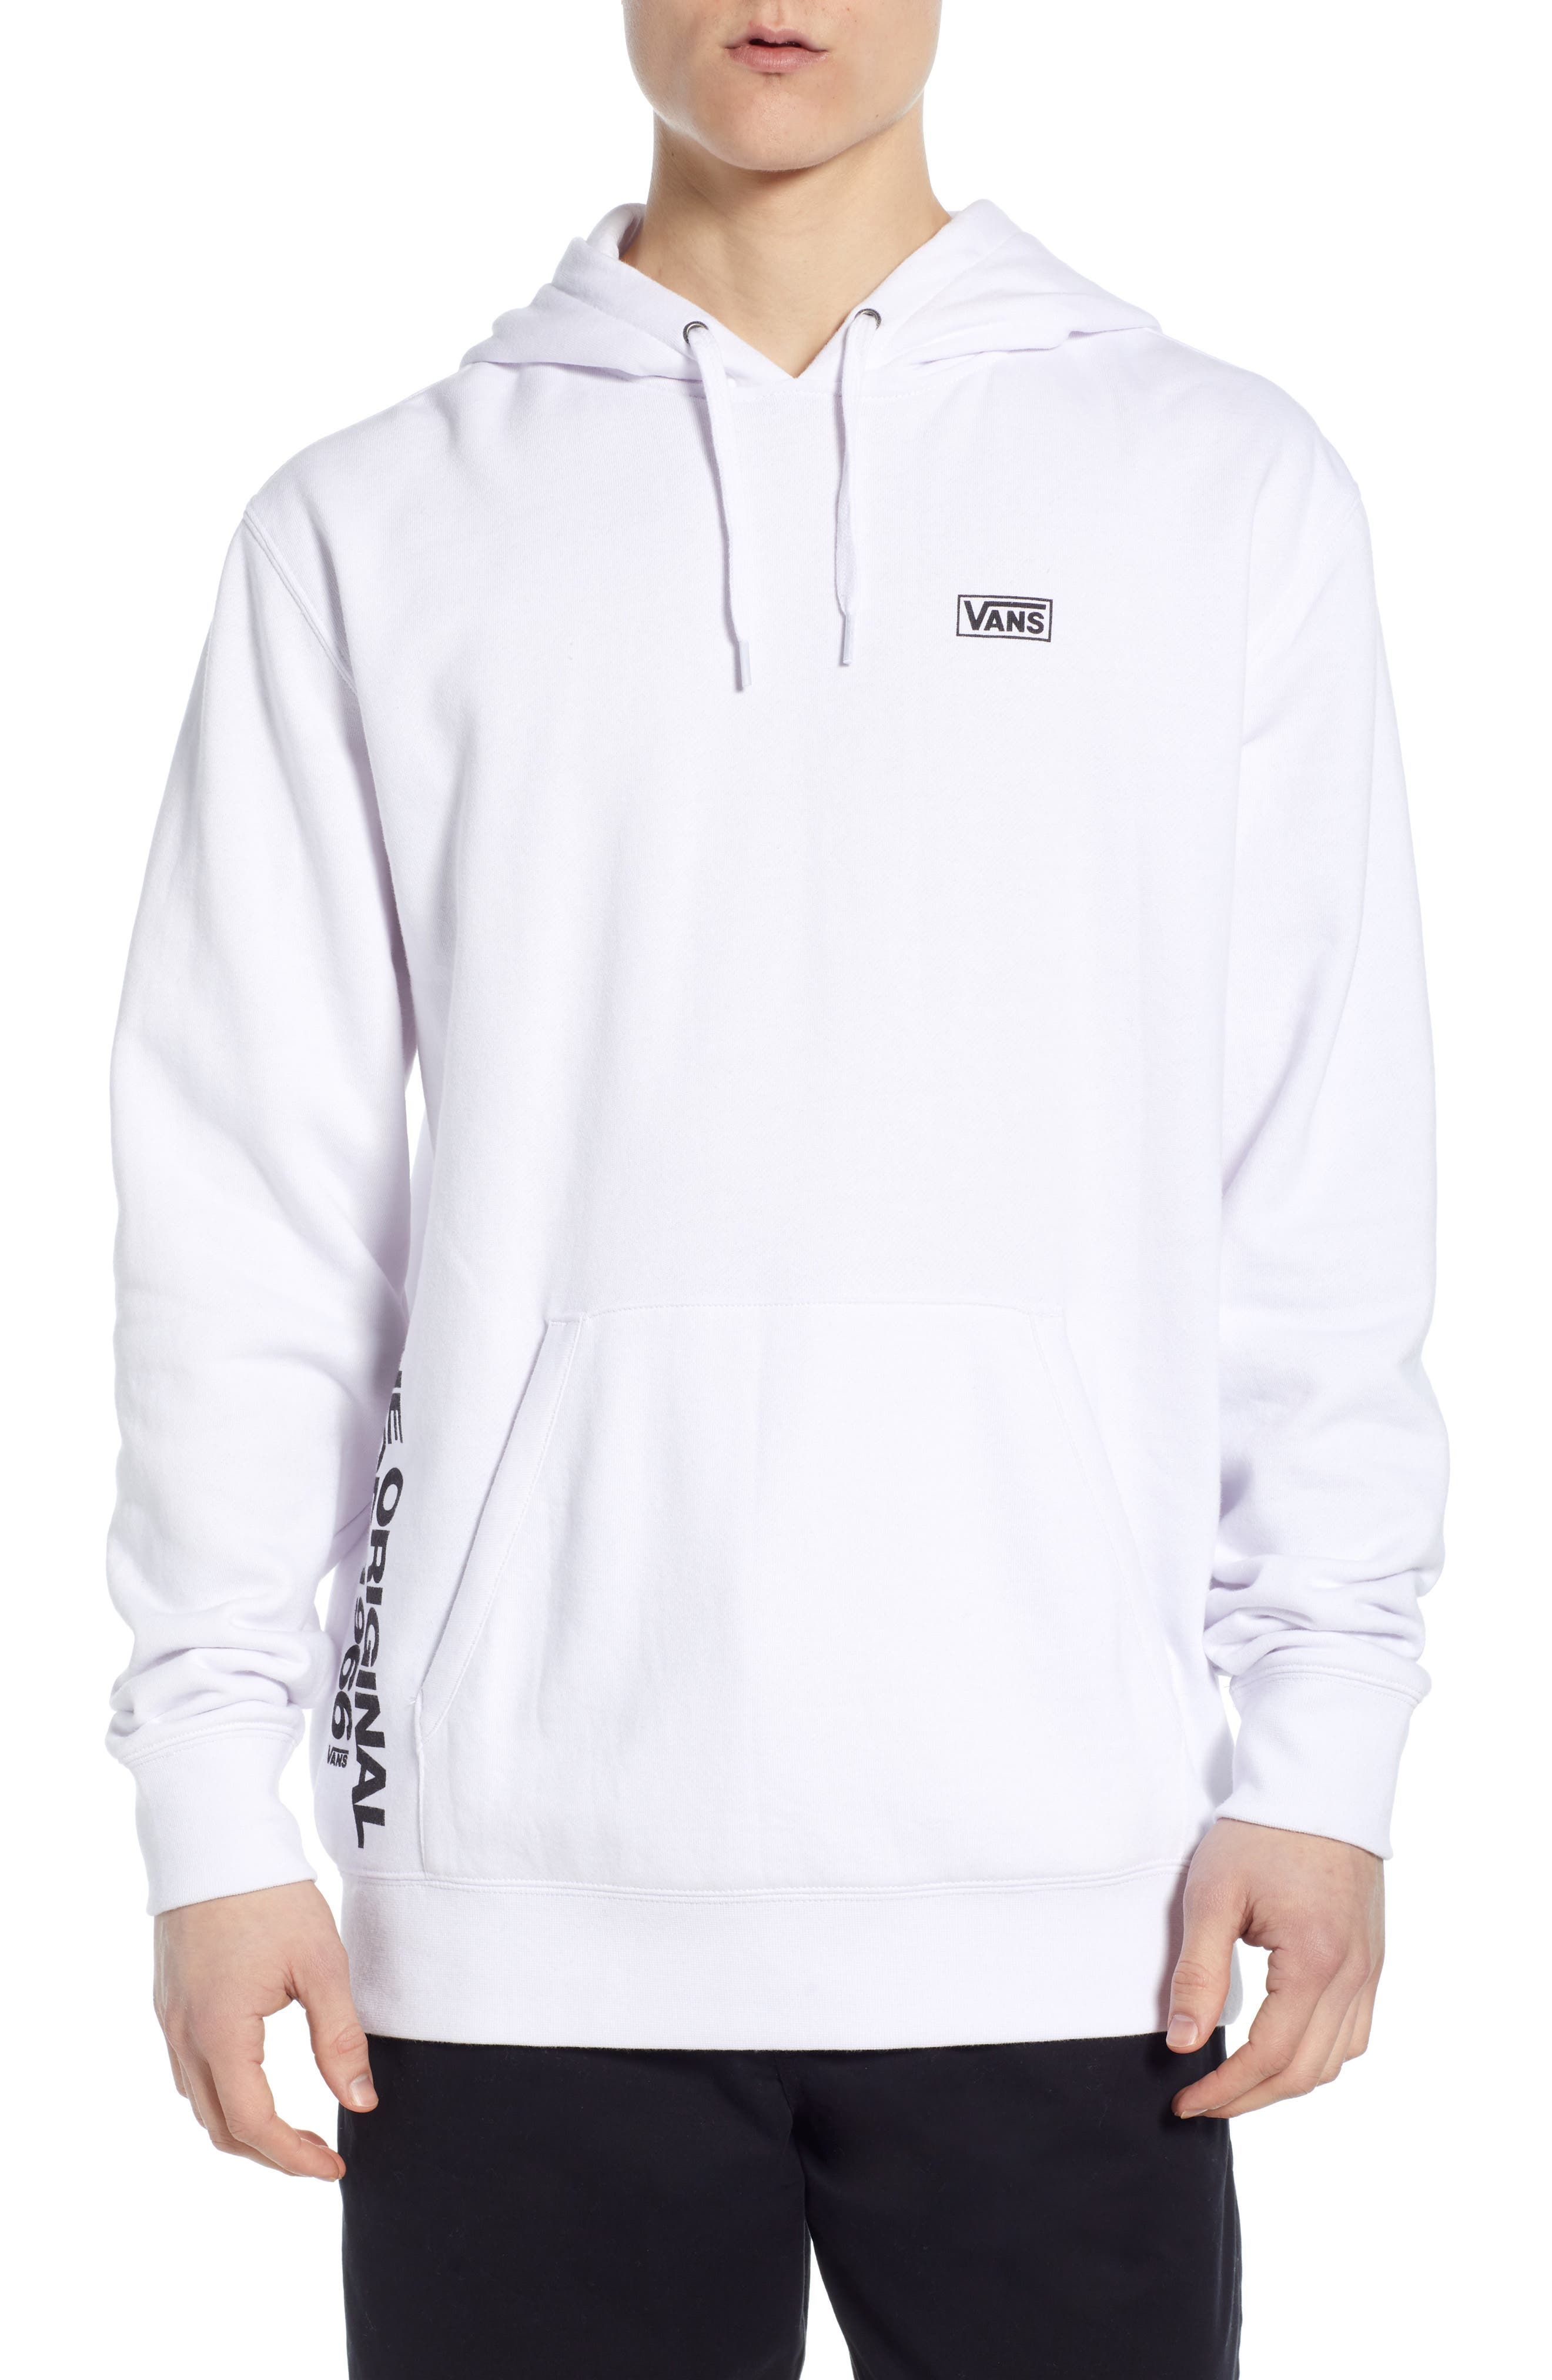 VANS Off the Wall Distort Hooded Sweatshirt, Main, color, WHITE